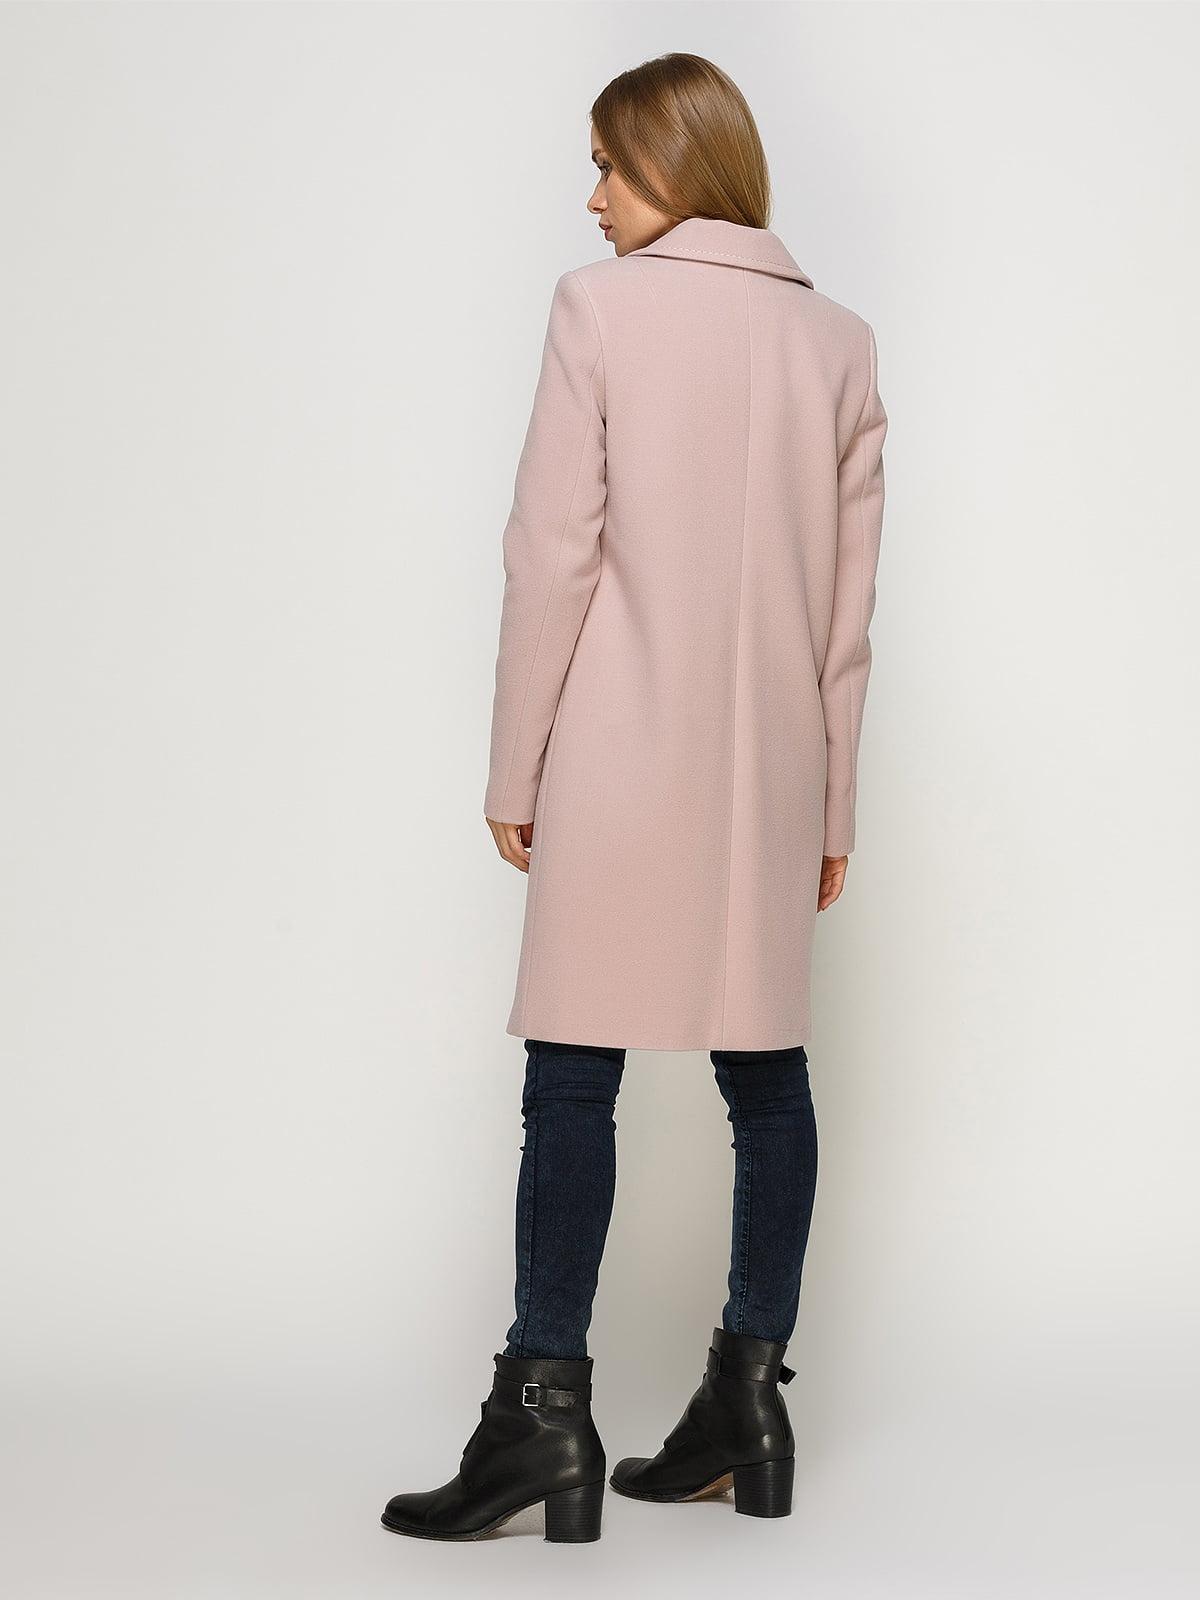 Пальто розовое   4492628   фото 3